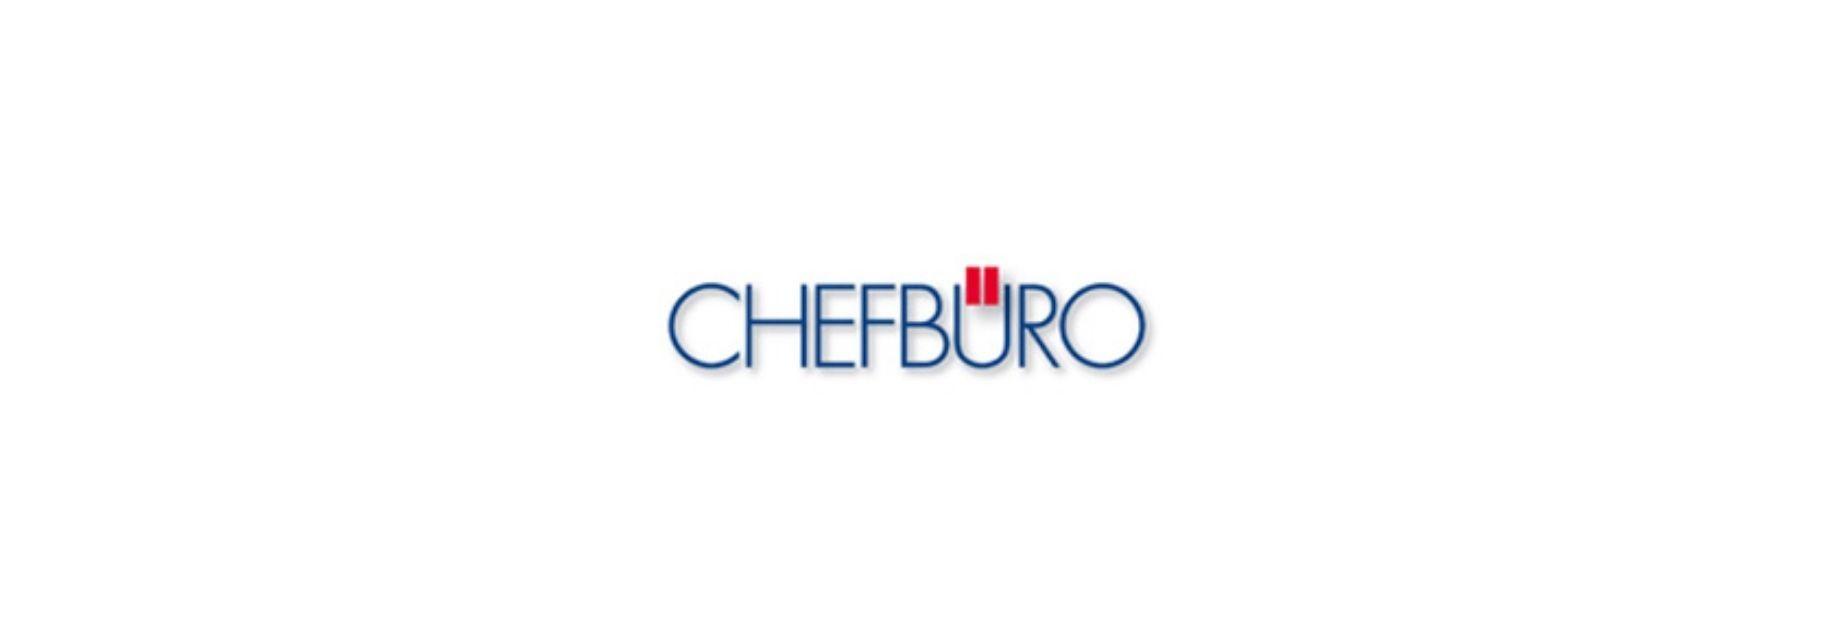 CHEFBURO